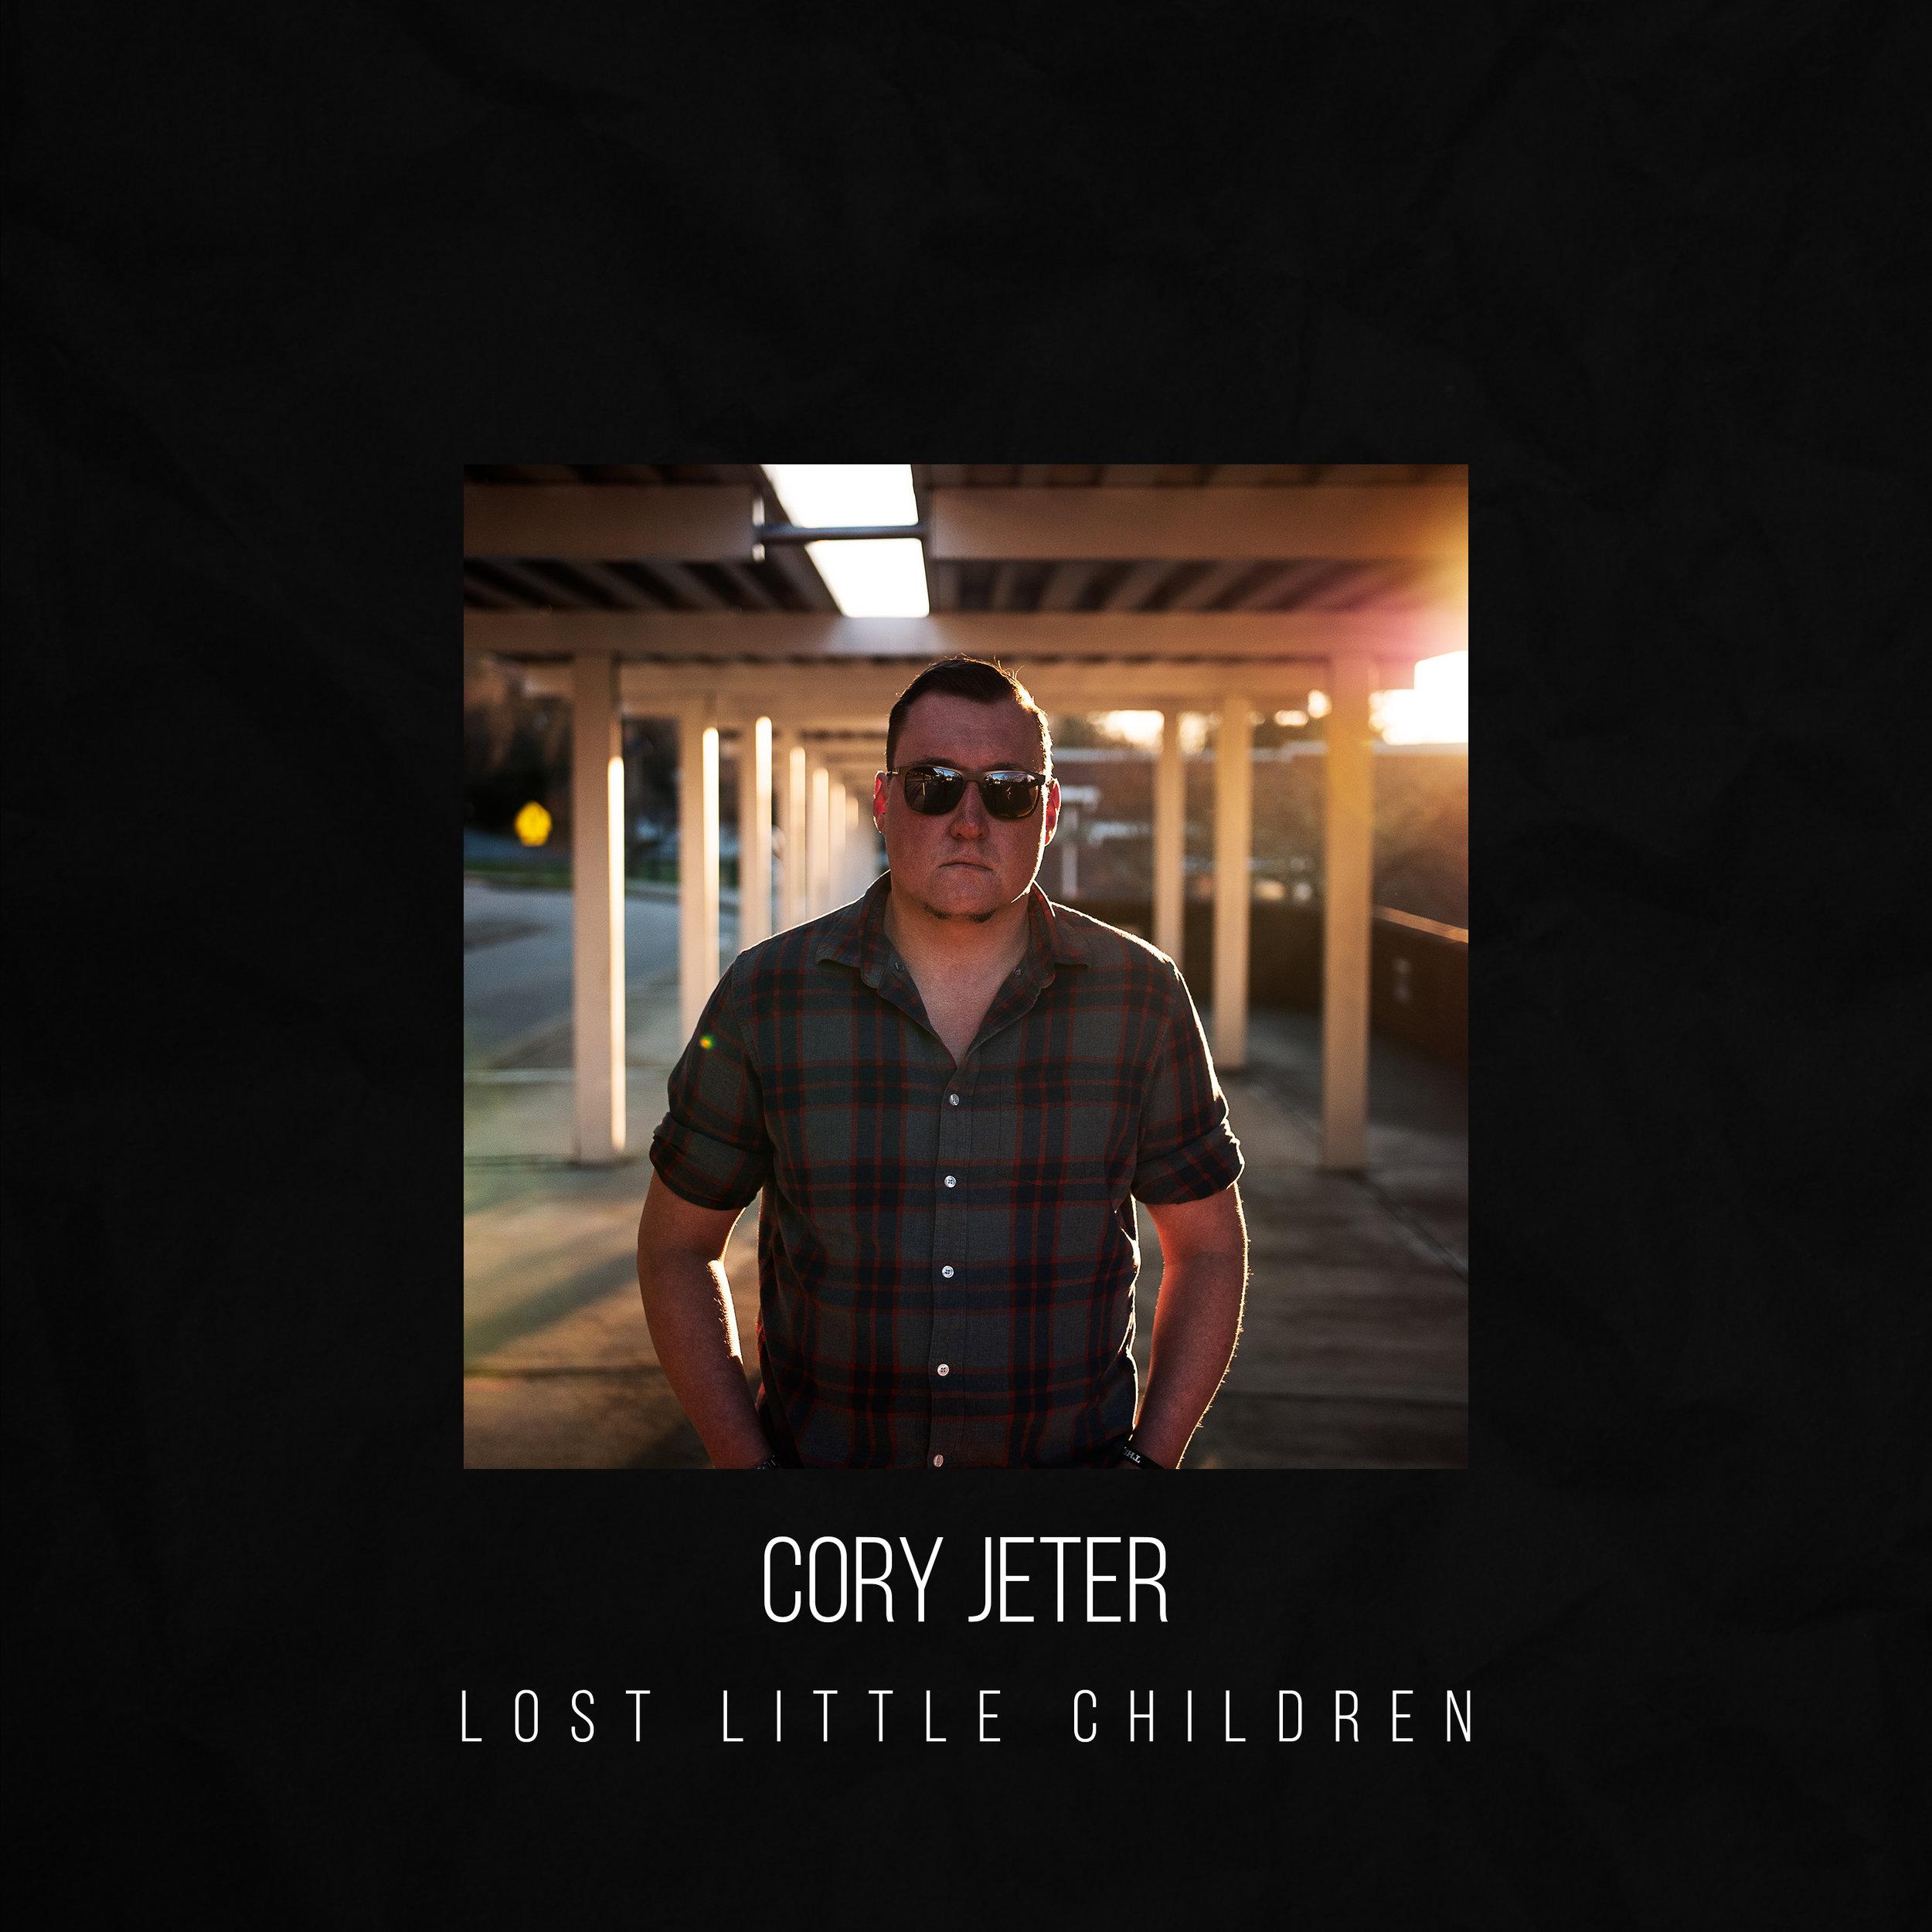 cory lost little children cover.jpg